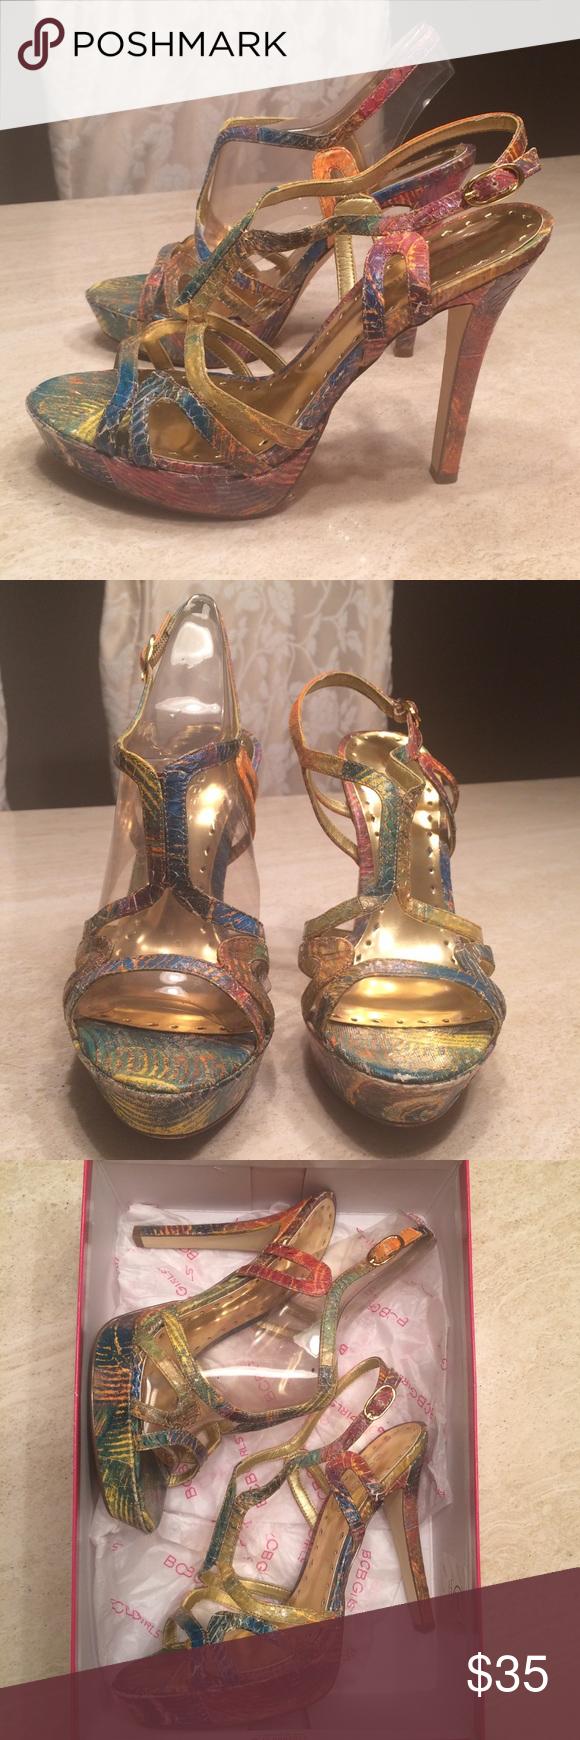 BCBG Heels BCBG Angel Heels in Multi Swirl Art Snake print. Worn a few times. Excellent Condition. Size 7 1/2 BCBG Shoes Heels